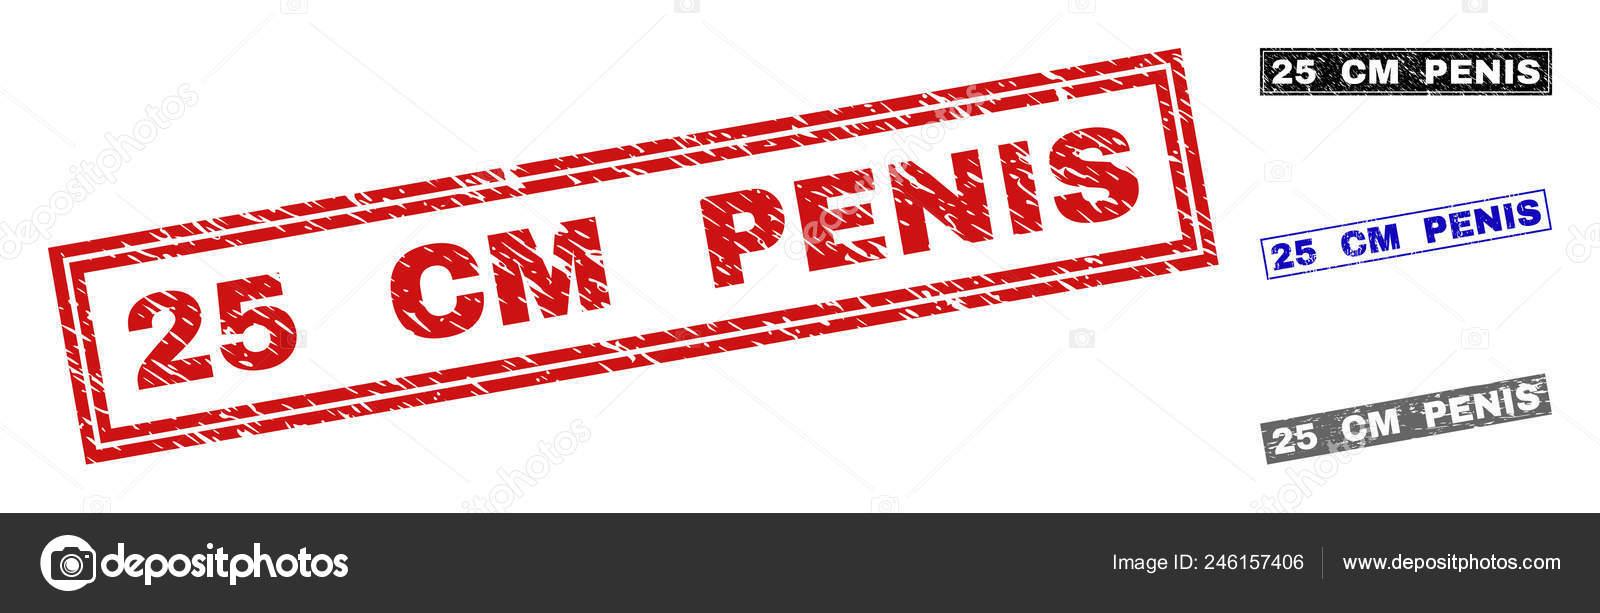 atașament penis 25 cm